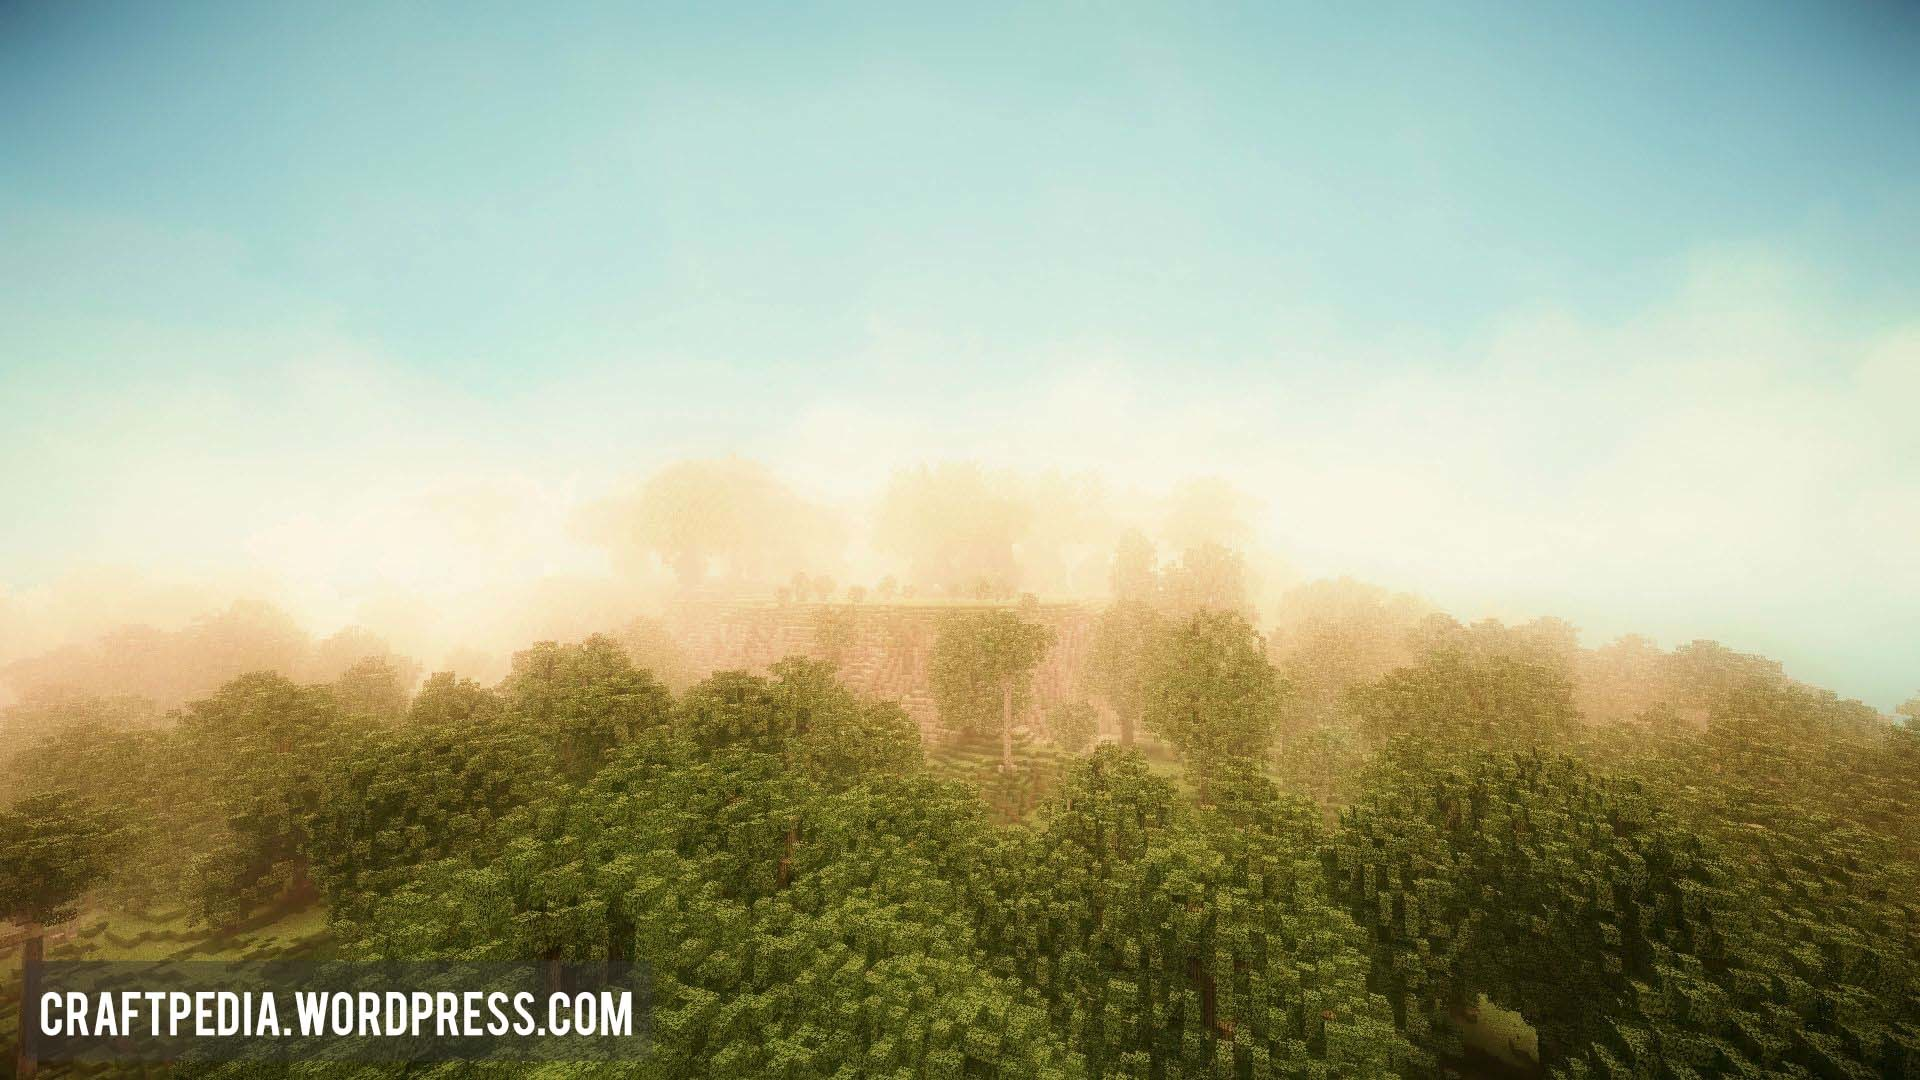 Foggy Woods Minecraft HD High Definition Blue Ray Wallpaper Desktop  Background Herobrine Biome